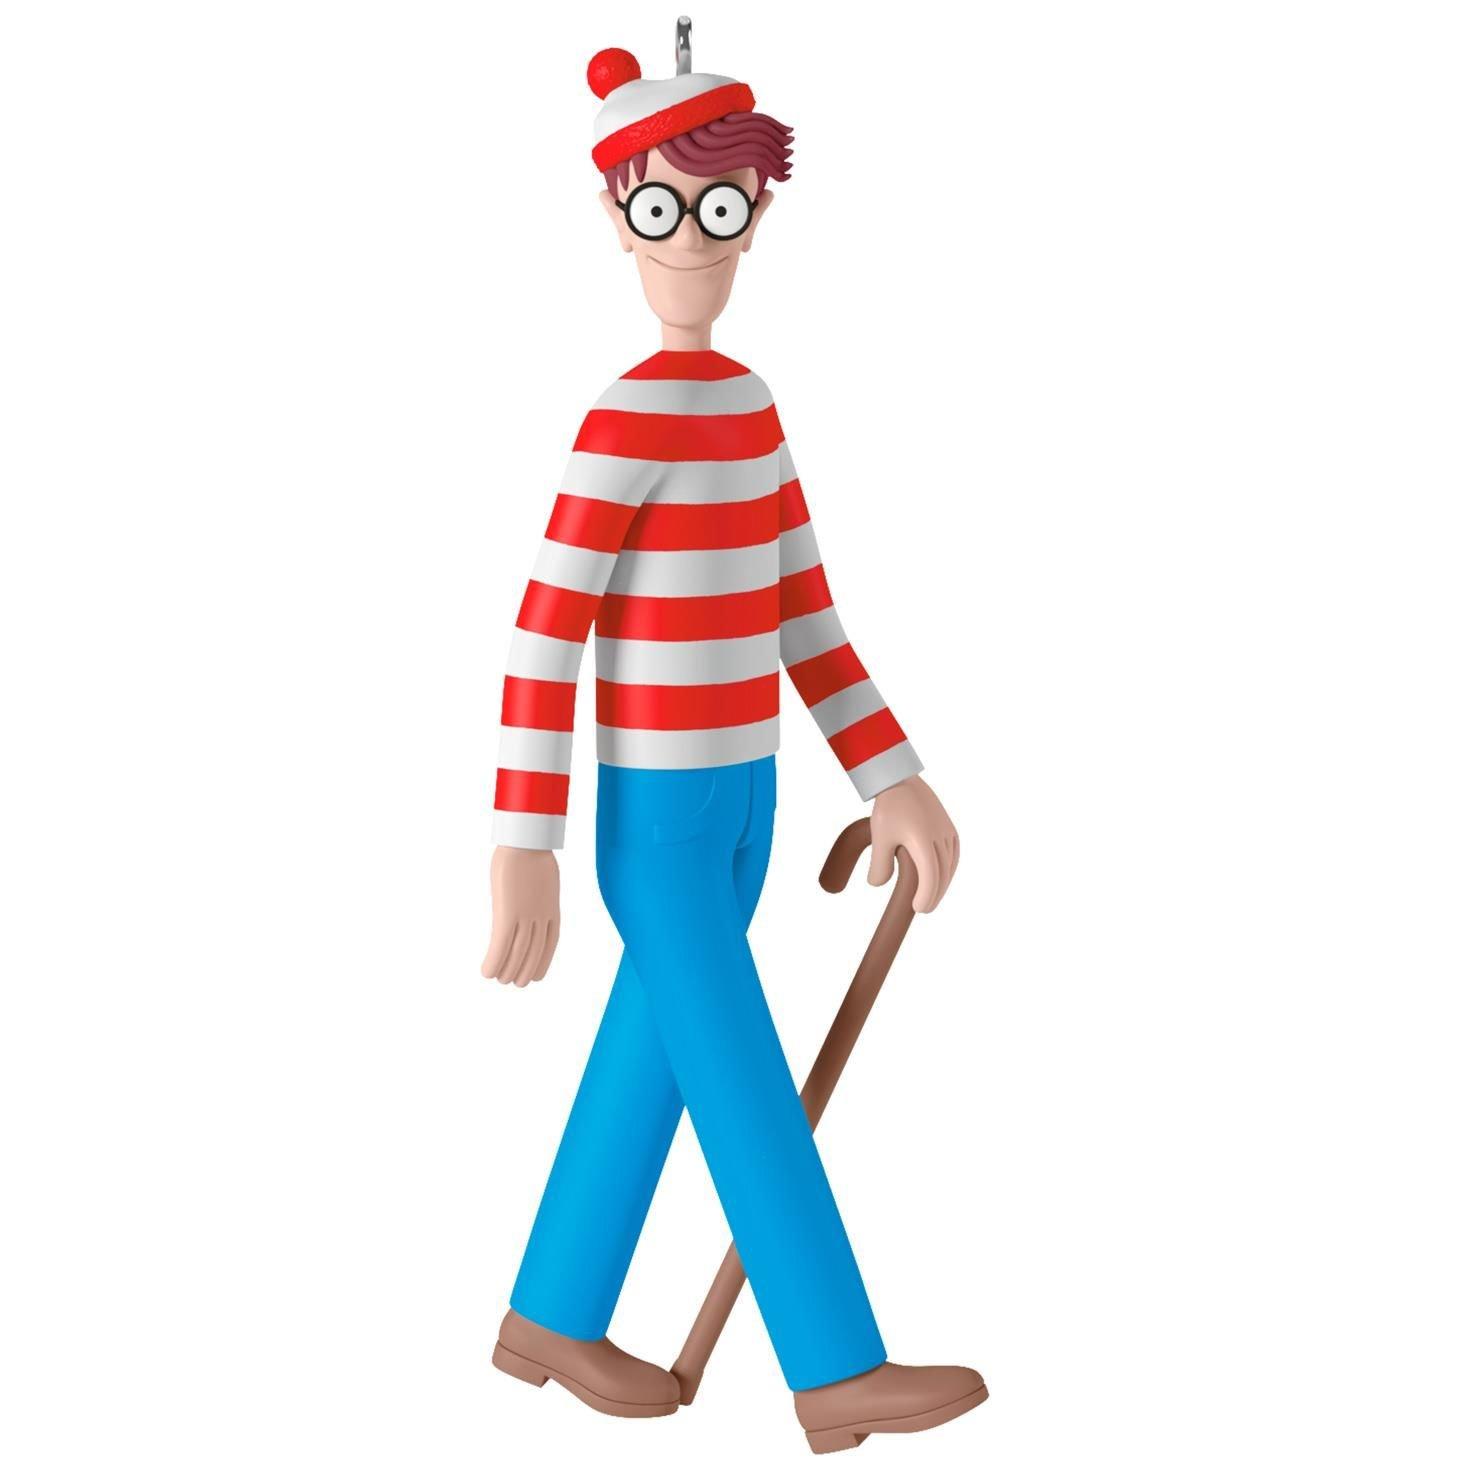 Where's Waldo? Ornament